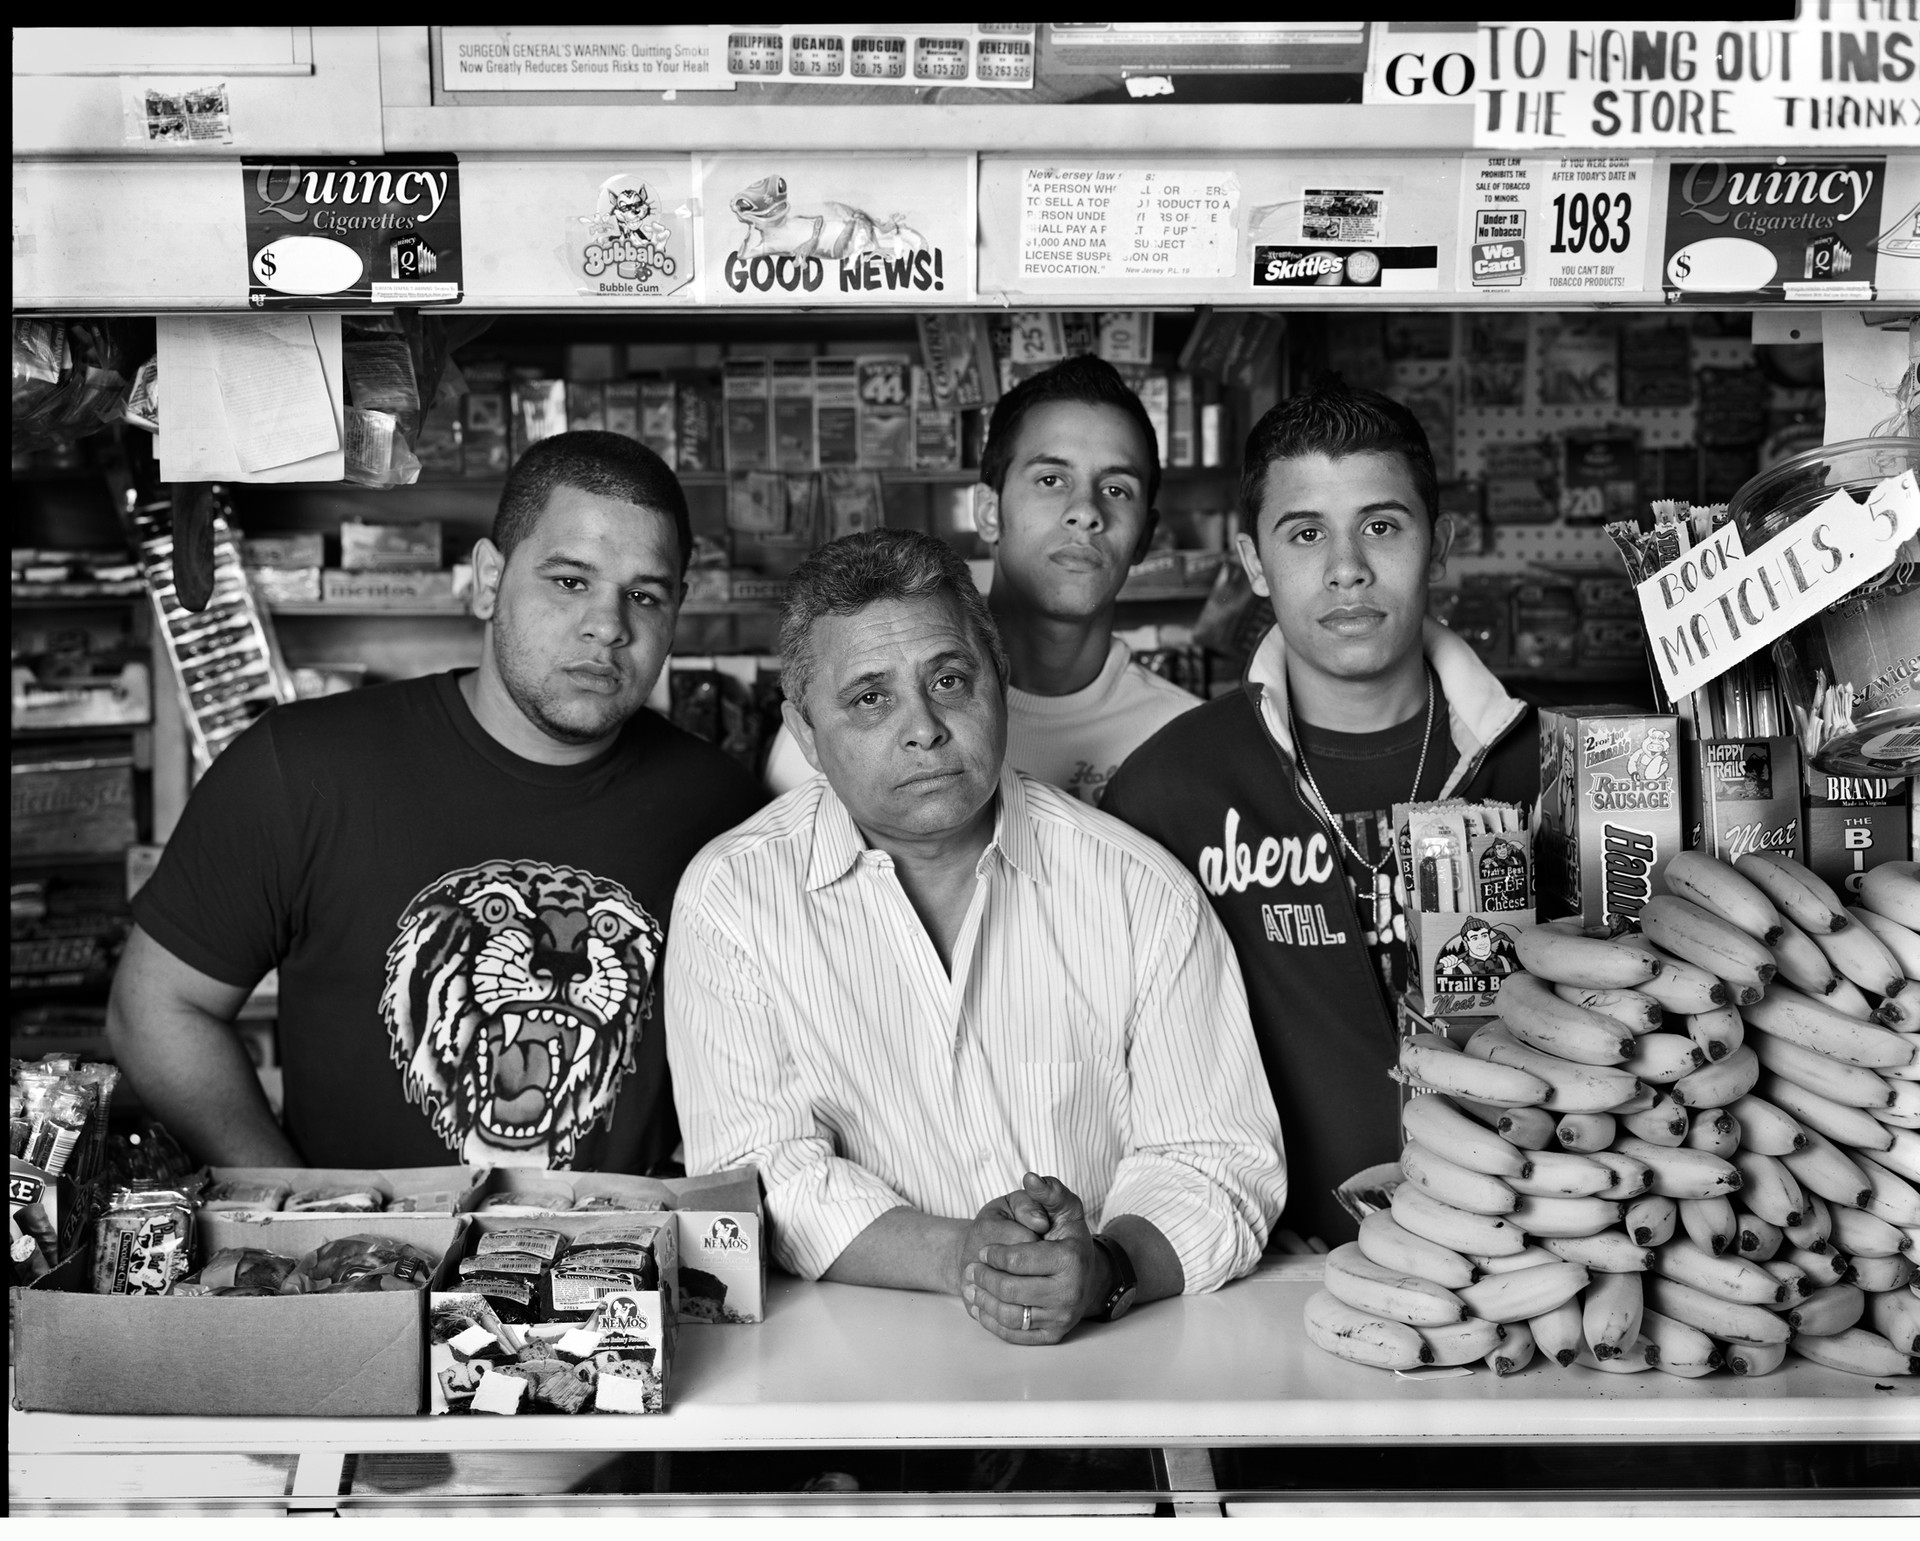 Bodega owner Juan Salvador and sons. Jersey City, NJ, 2007